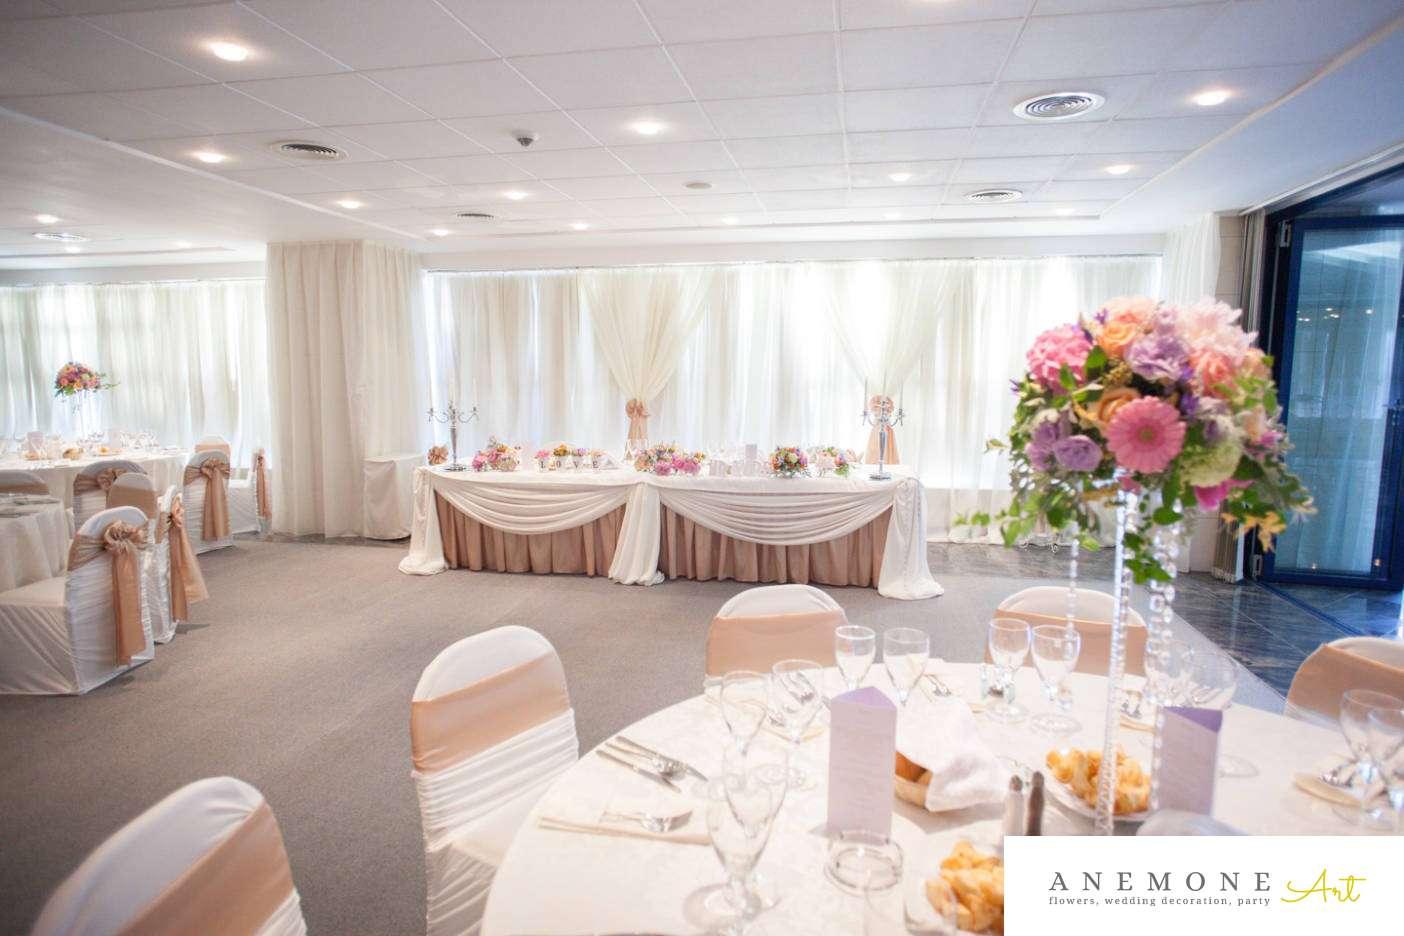 Poza, foto cu Flori de nunta decor masa, decor sala, hotel continental, prezidiu in Arad, Timisoara, Oradea (wedding flowers, bouquets) nunta Arad